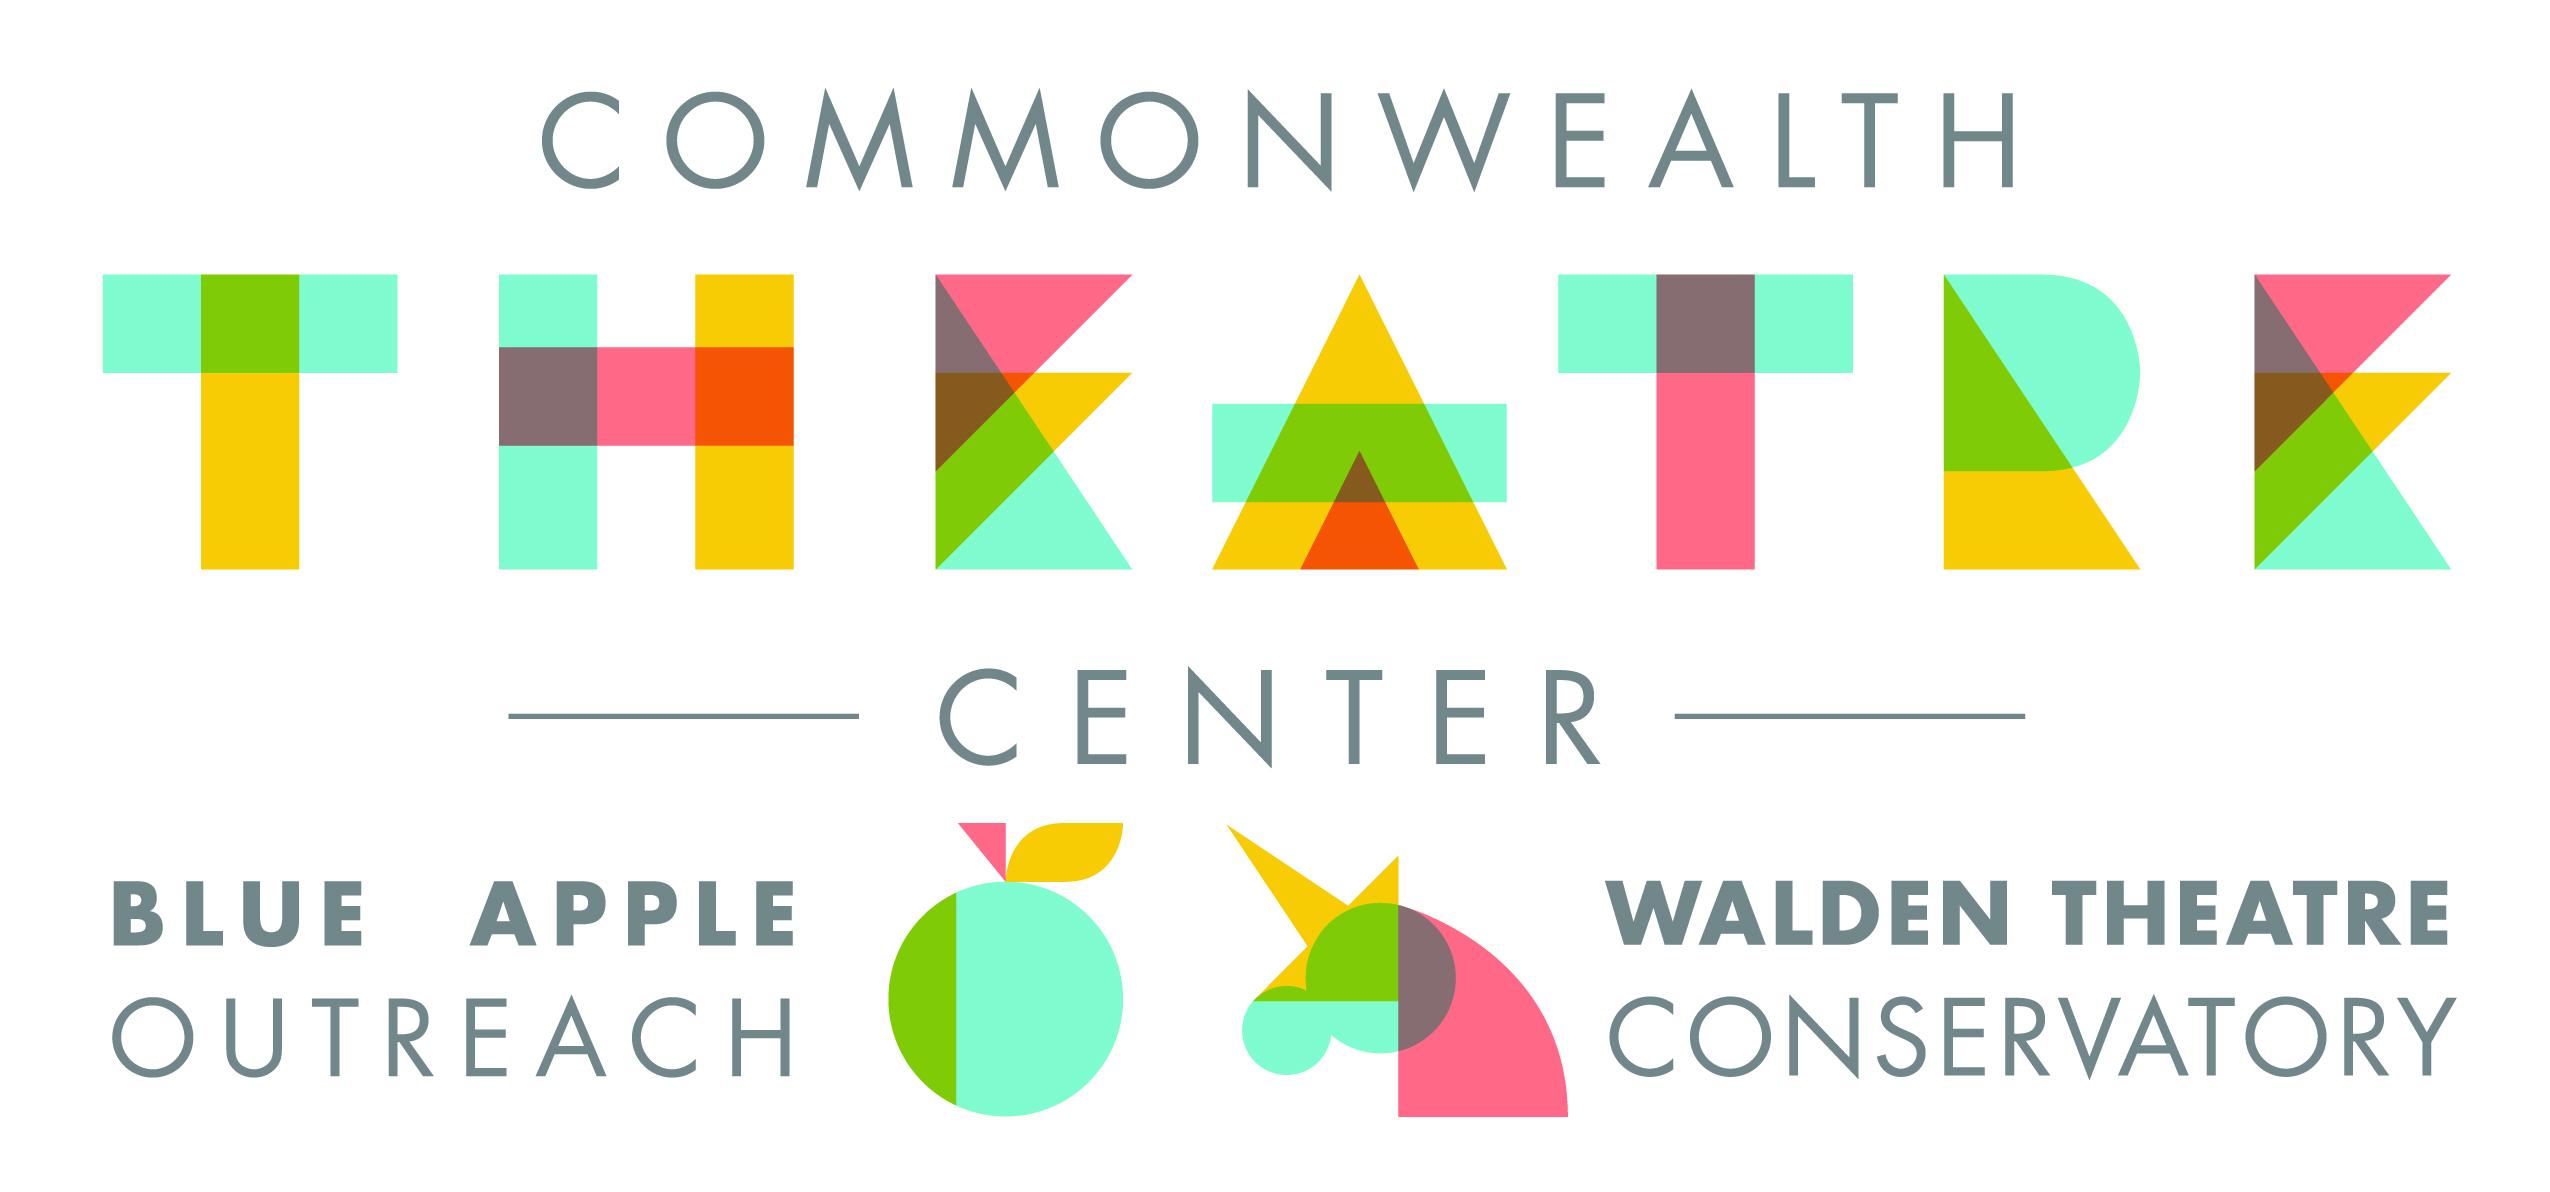 Walden + Blue Apple = Commonwealth Theatre Center